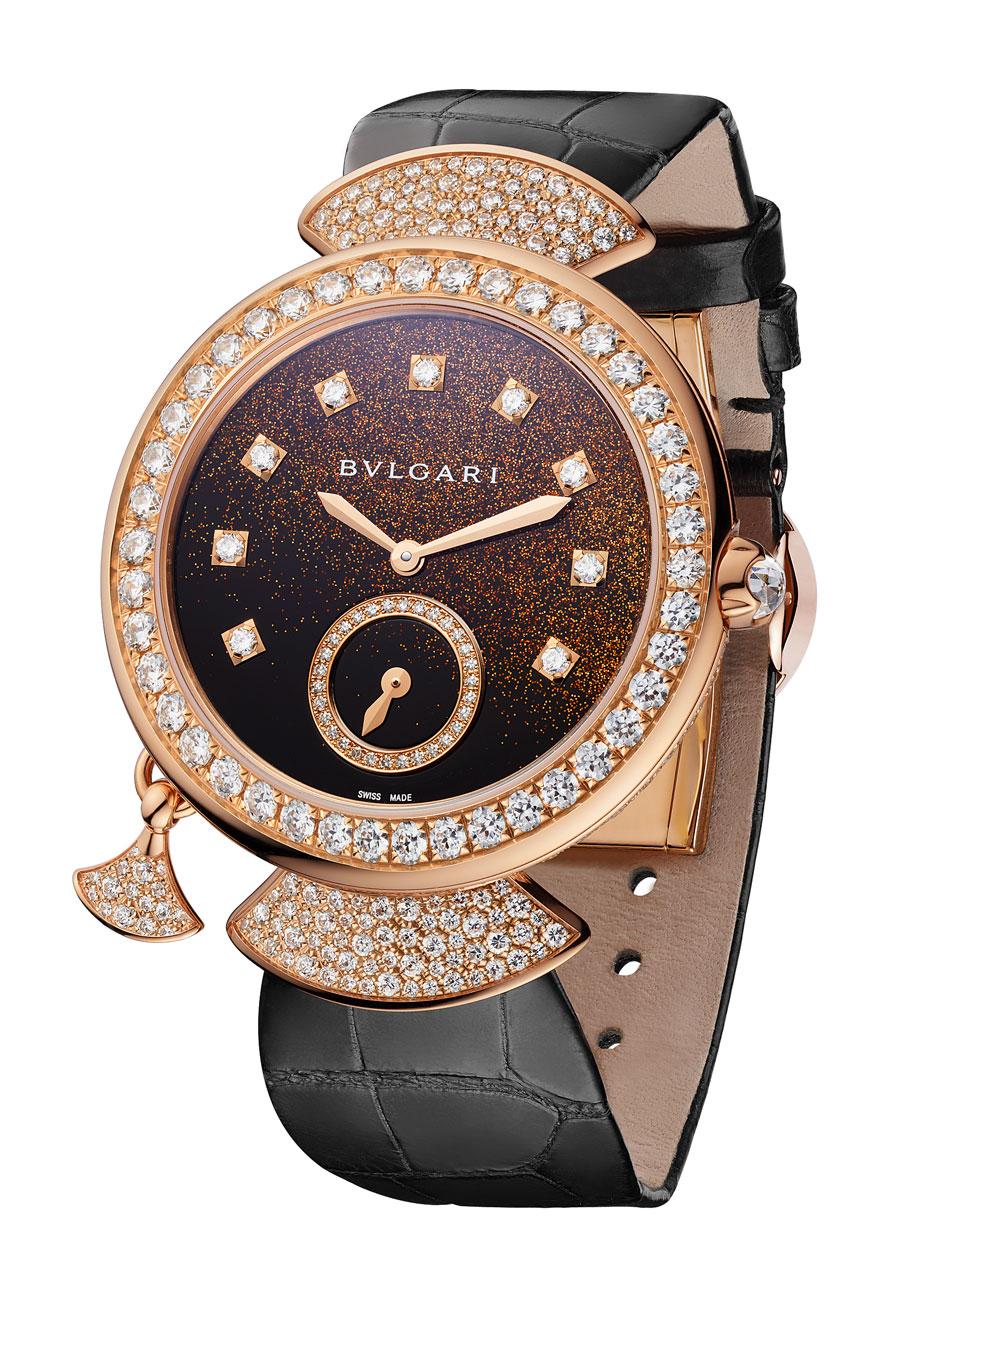 Reloj femenino Bulgari Diva's Dream Minute Repeater